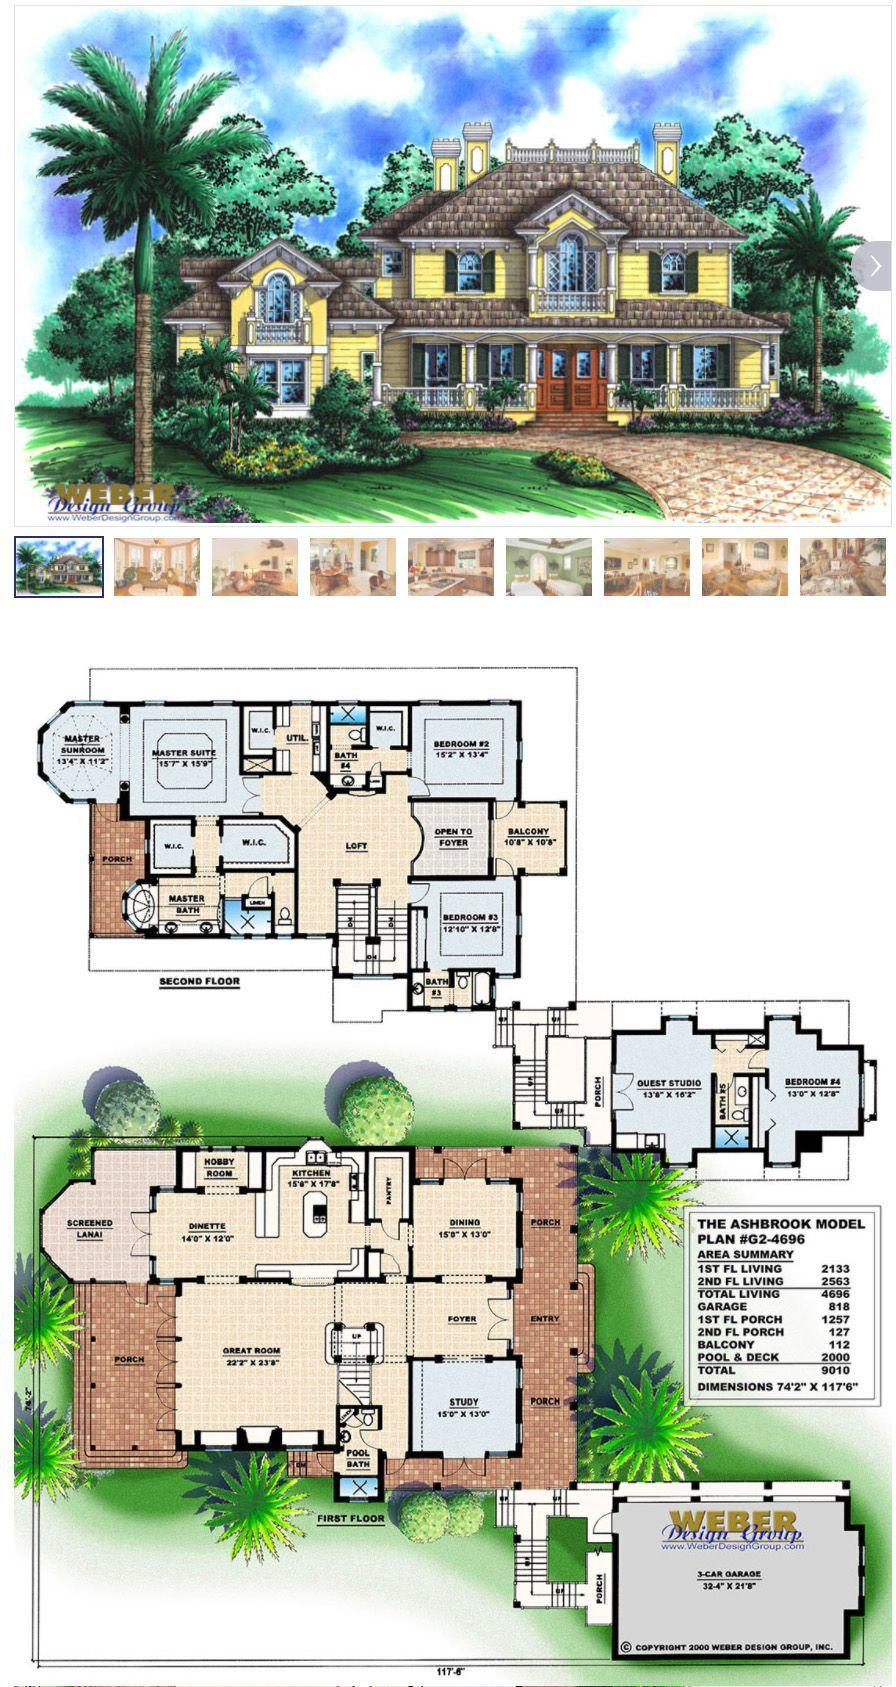 2 story house plan charleston style waterfront home floor plan rh pinterest ca